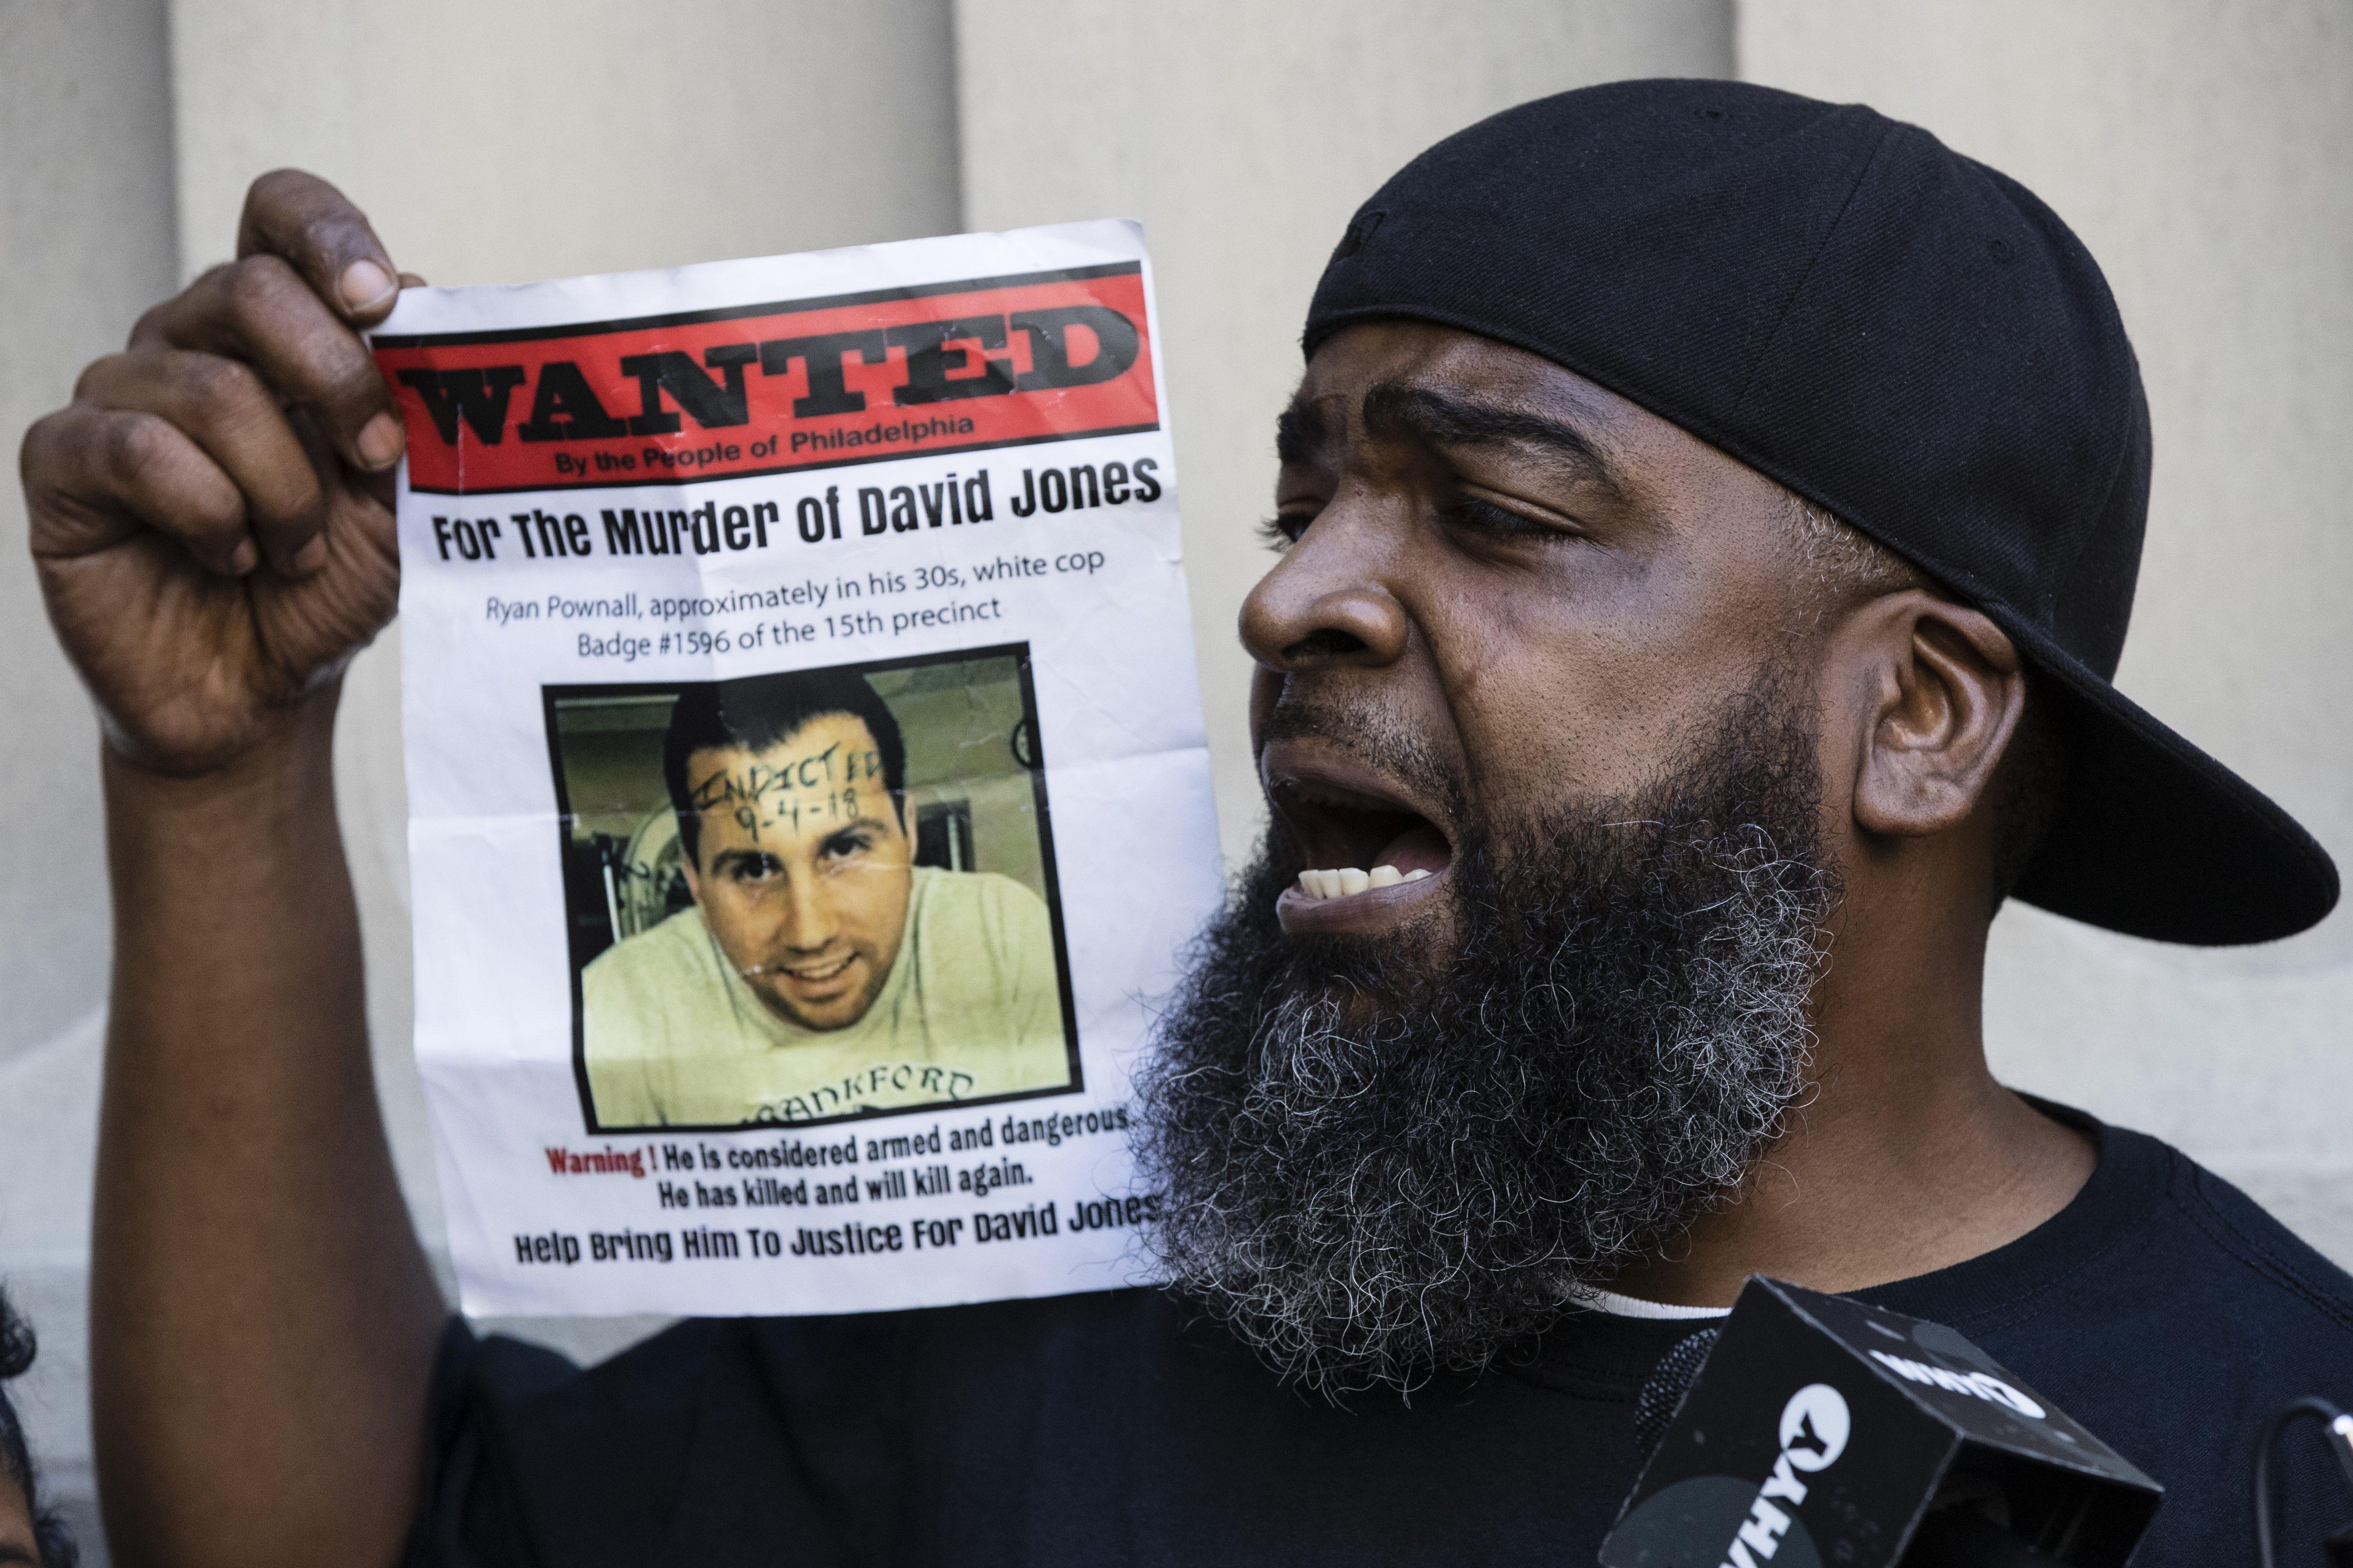 Isaac Gardner speaks while holding up a photo of David Jones